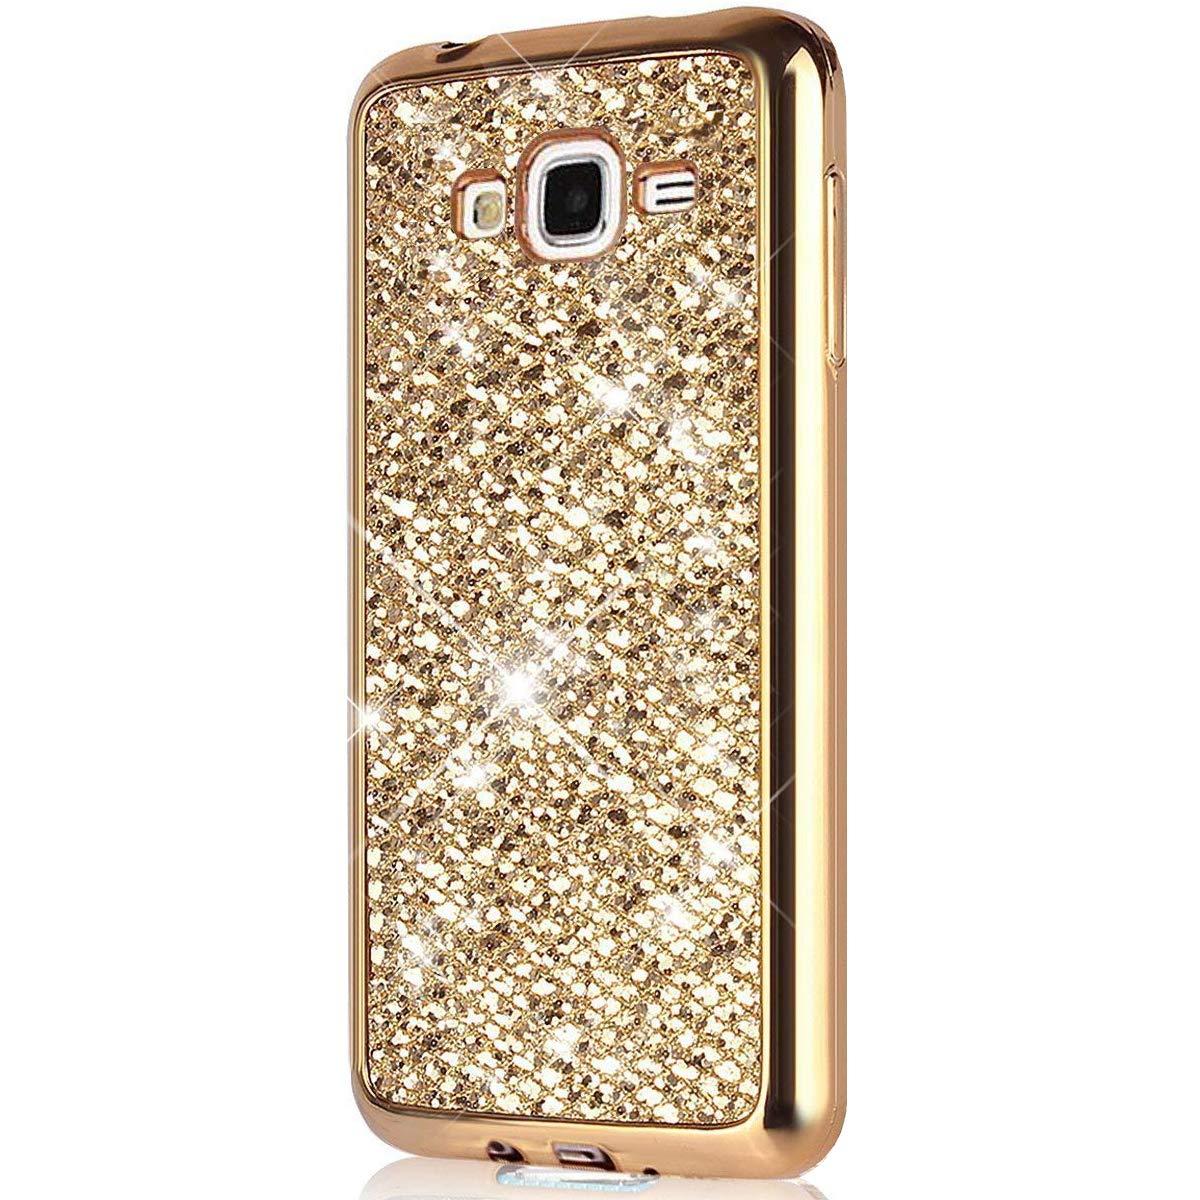 Custodia Samsung S4 Custodia Protettiva Antiurto In TPU IPhone X